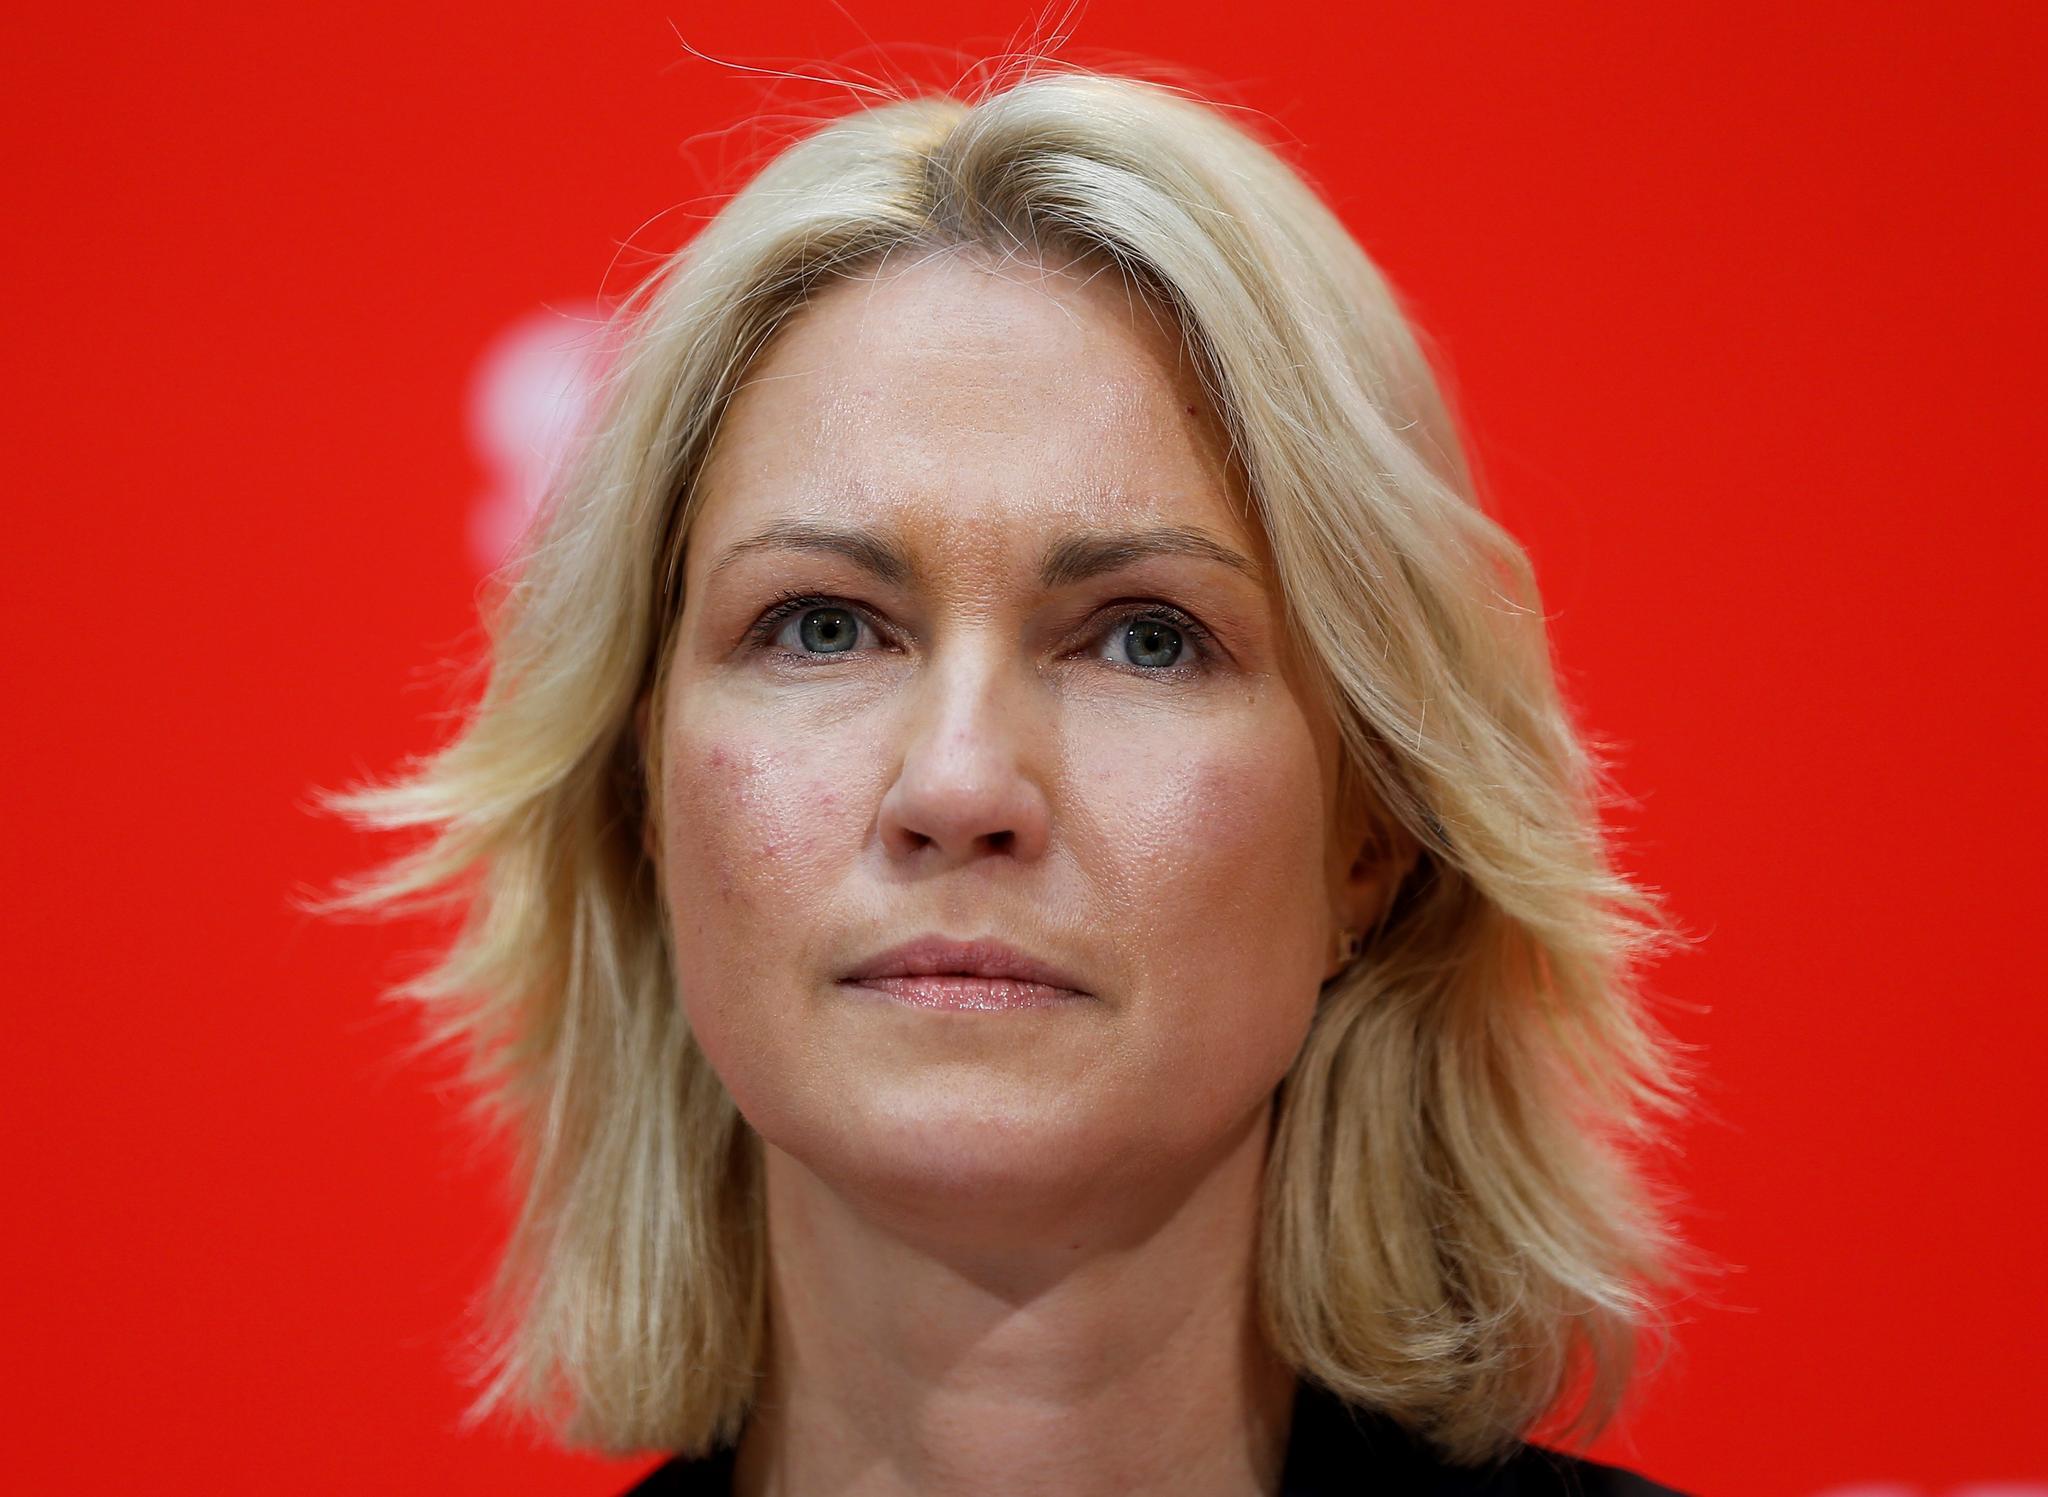 Manuela Schwesig Aktuell